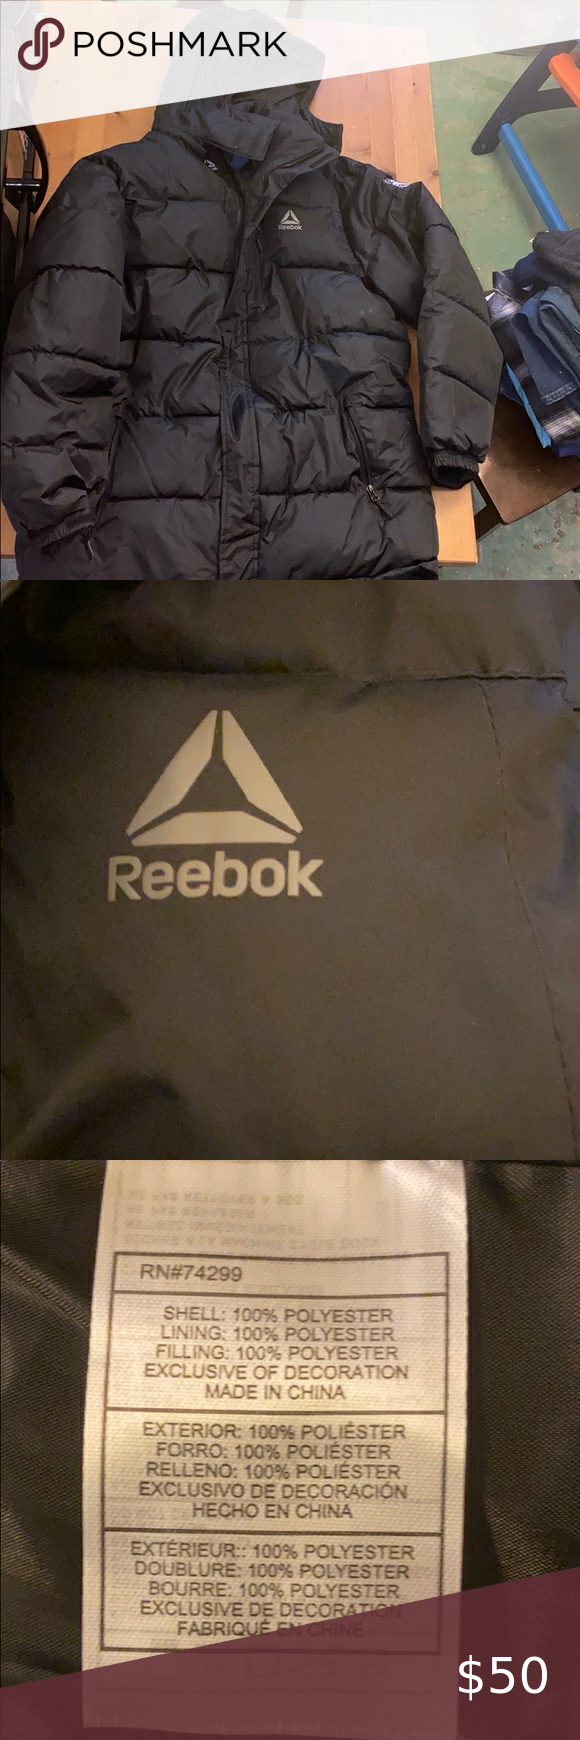 Reebok Puffer Jacket Puffer Jackets Black Puffer Jacket Reebok [ 1740 x 580 Pixel ]